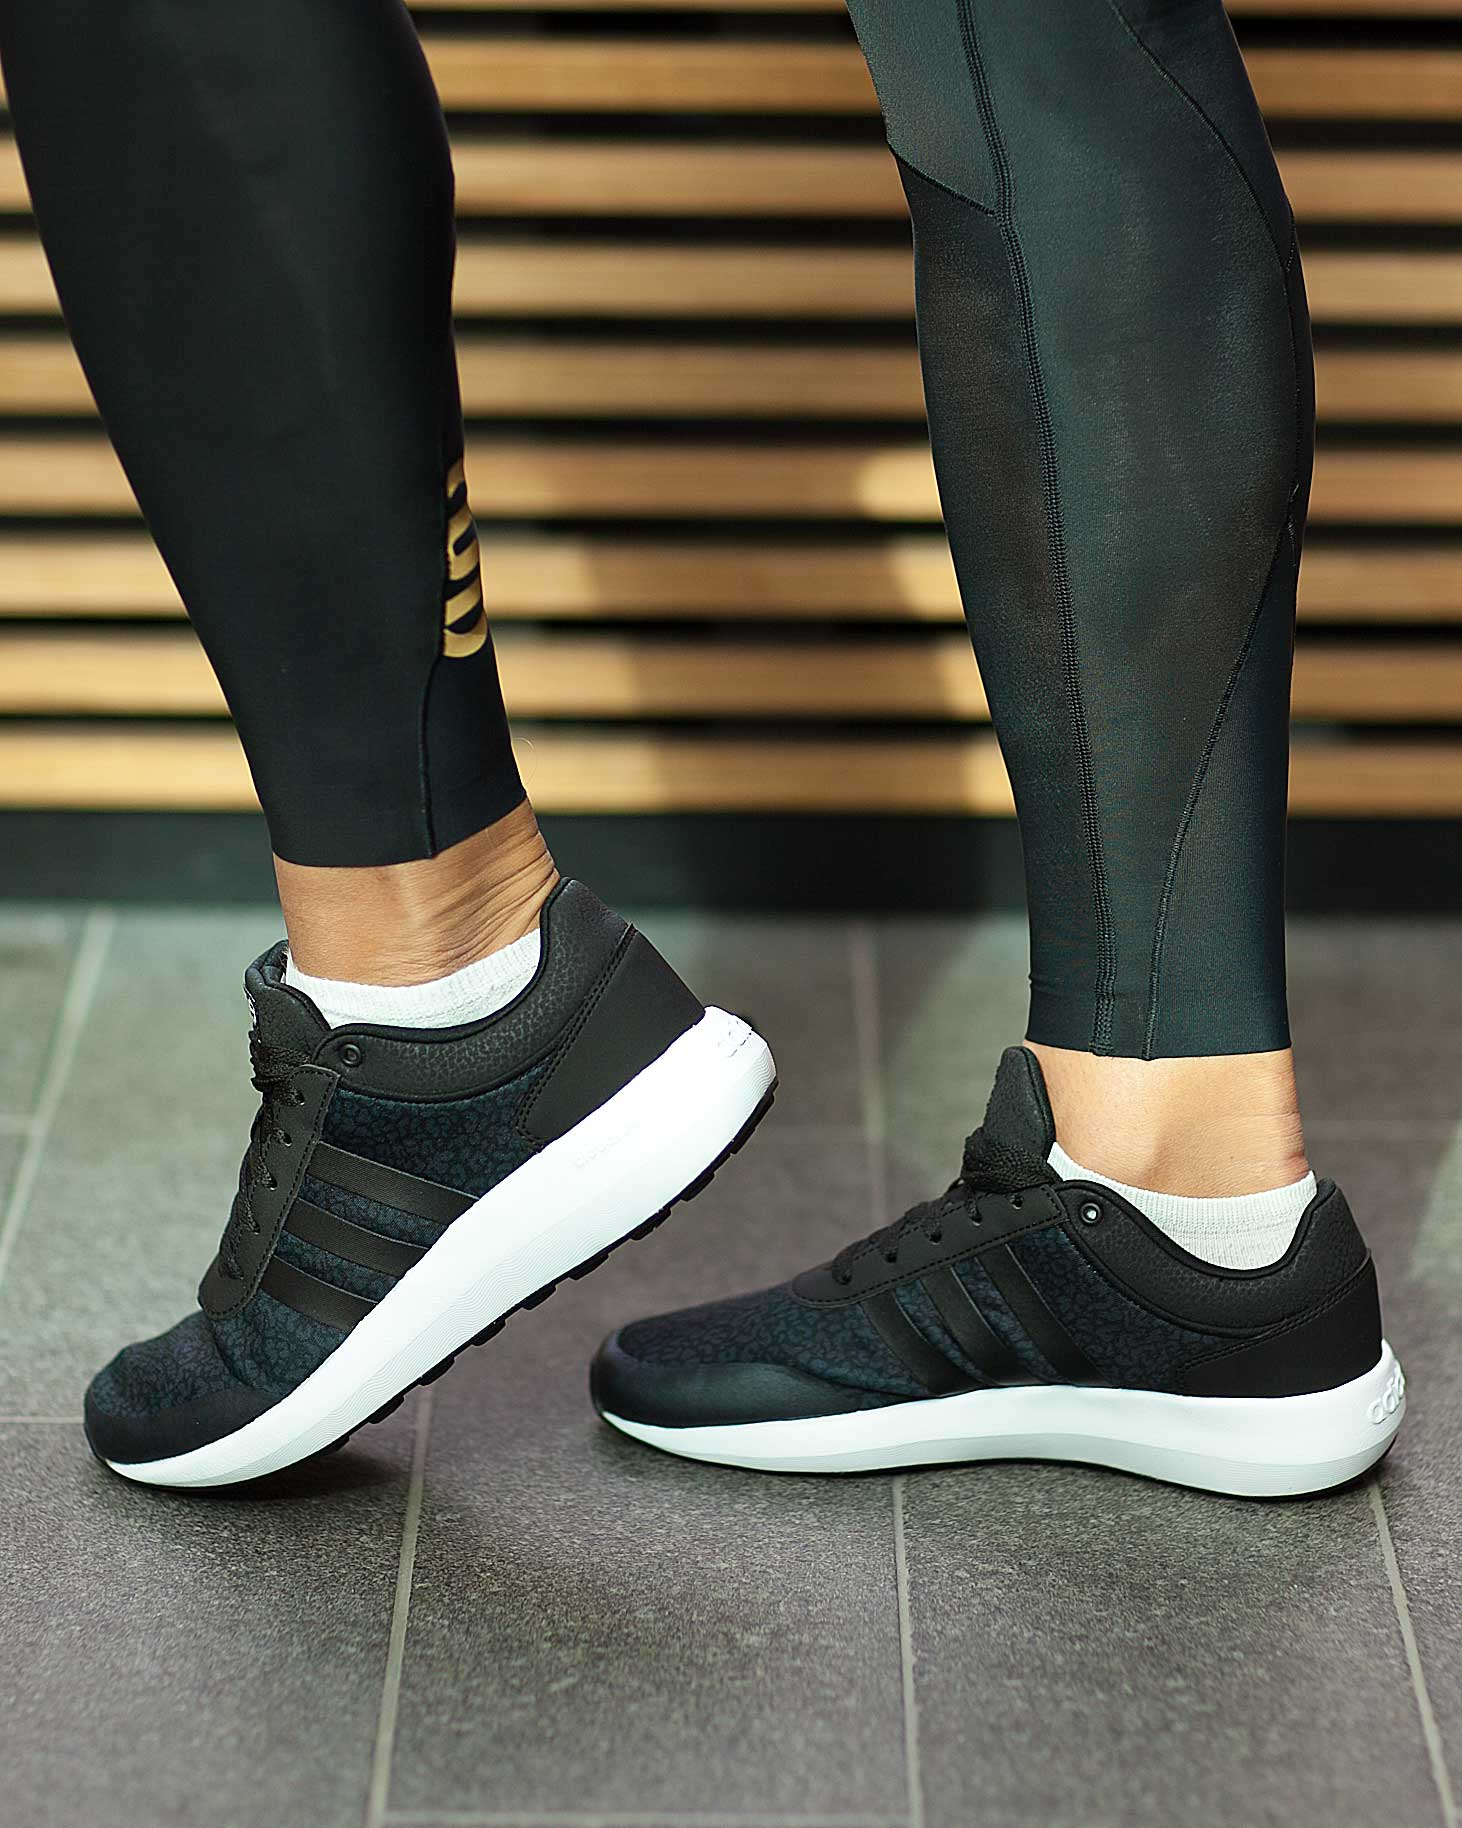 adidas Womens Neo Cloudfoam Race Shoes Tights.no